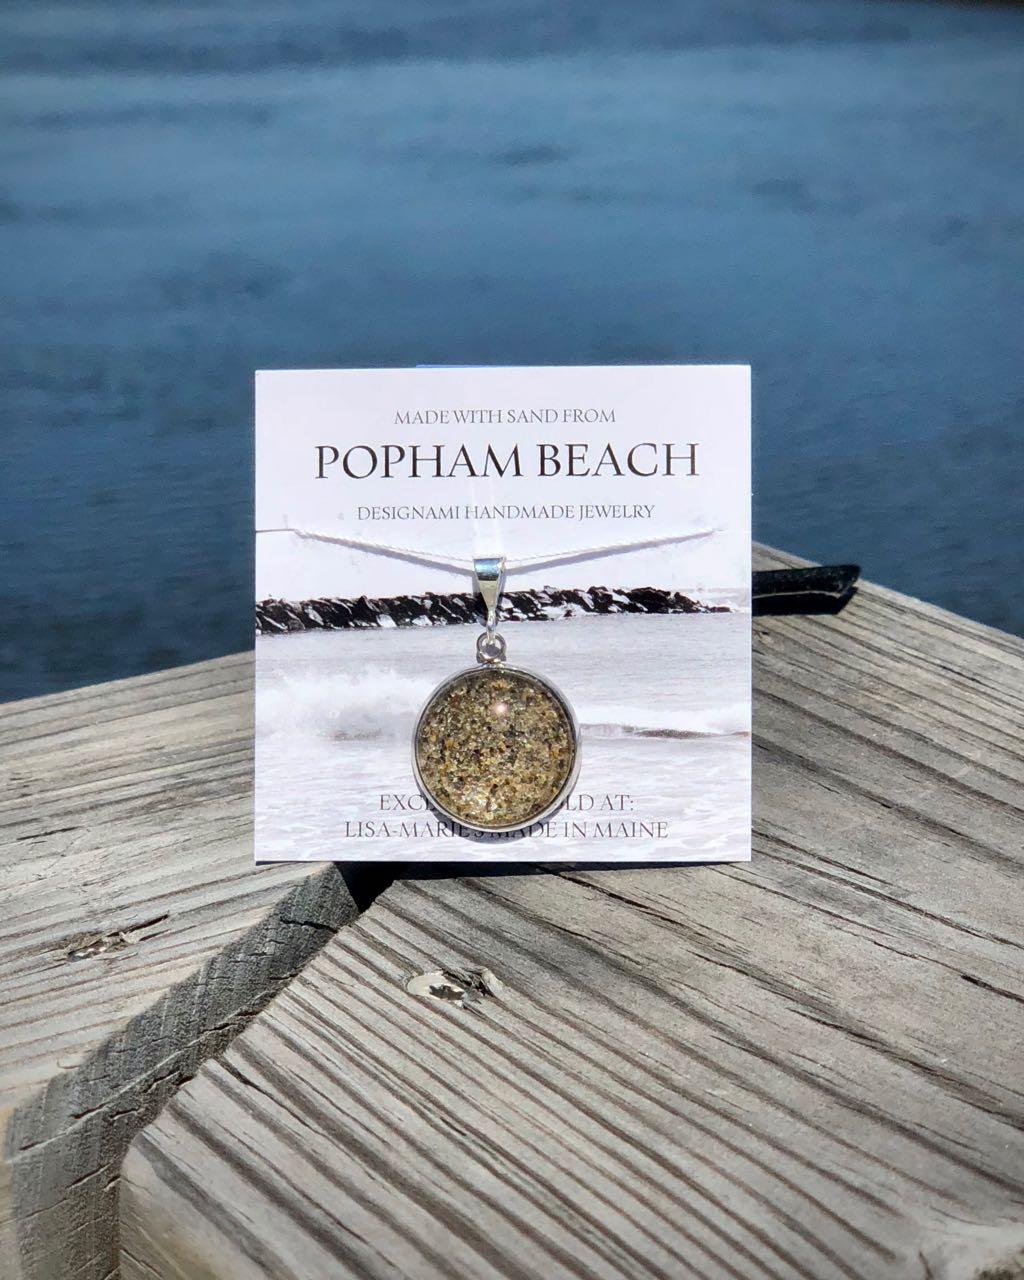 Popham Beach Sand Bangle Bracelet, Popham Beach Sand Jewelry